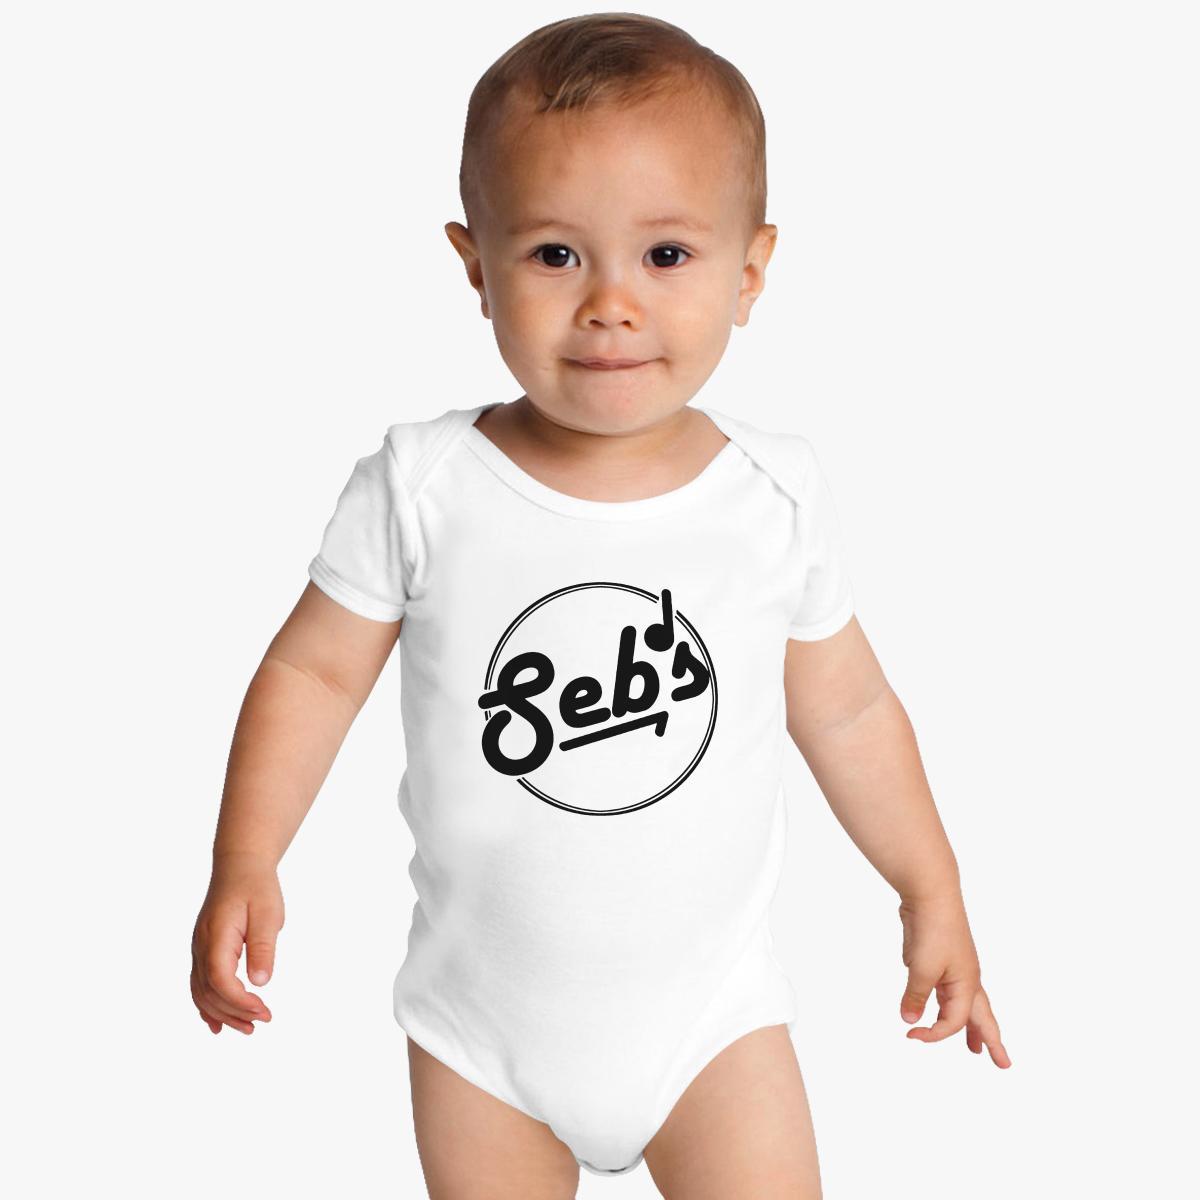 La la Land Sebs Baby Onesies